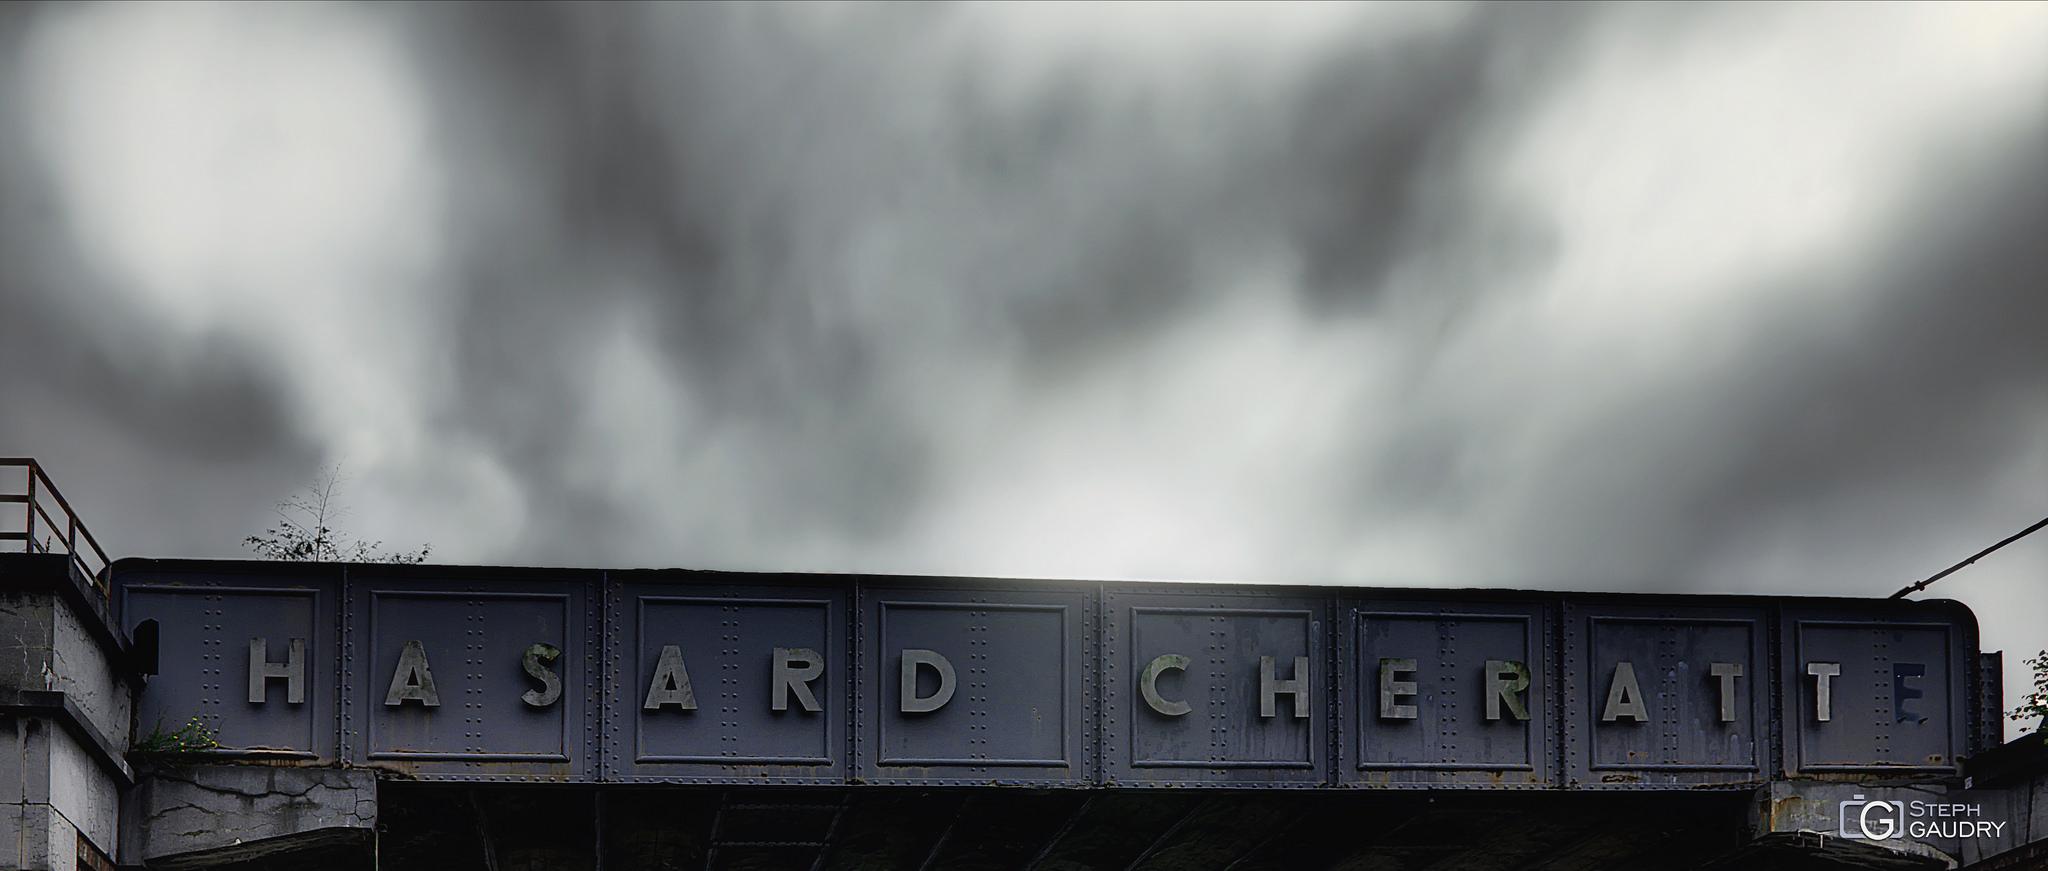 HASARD CHERATT(E) [Click to start slideshow]